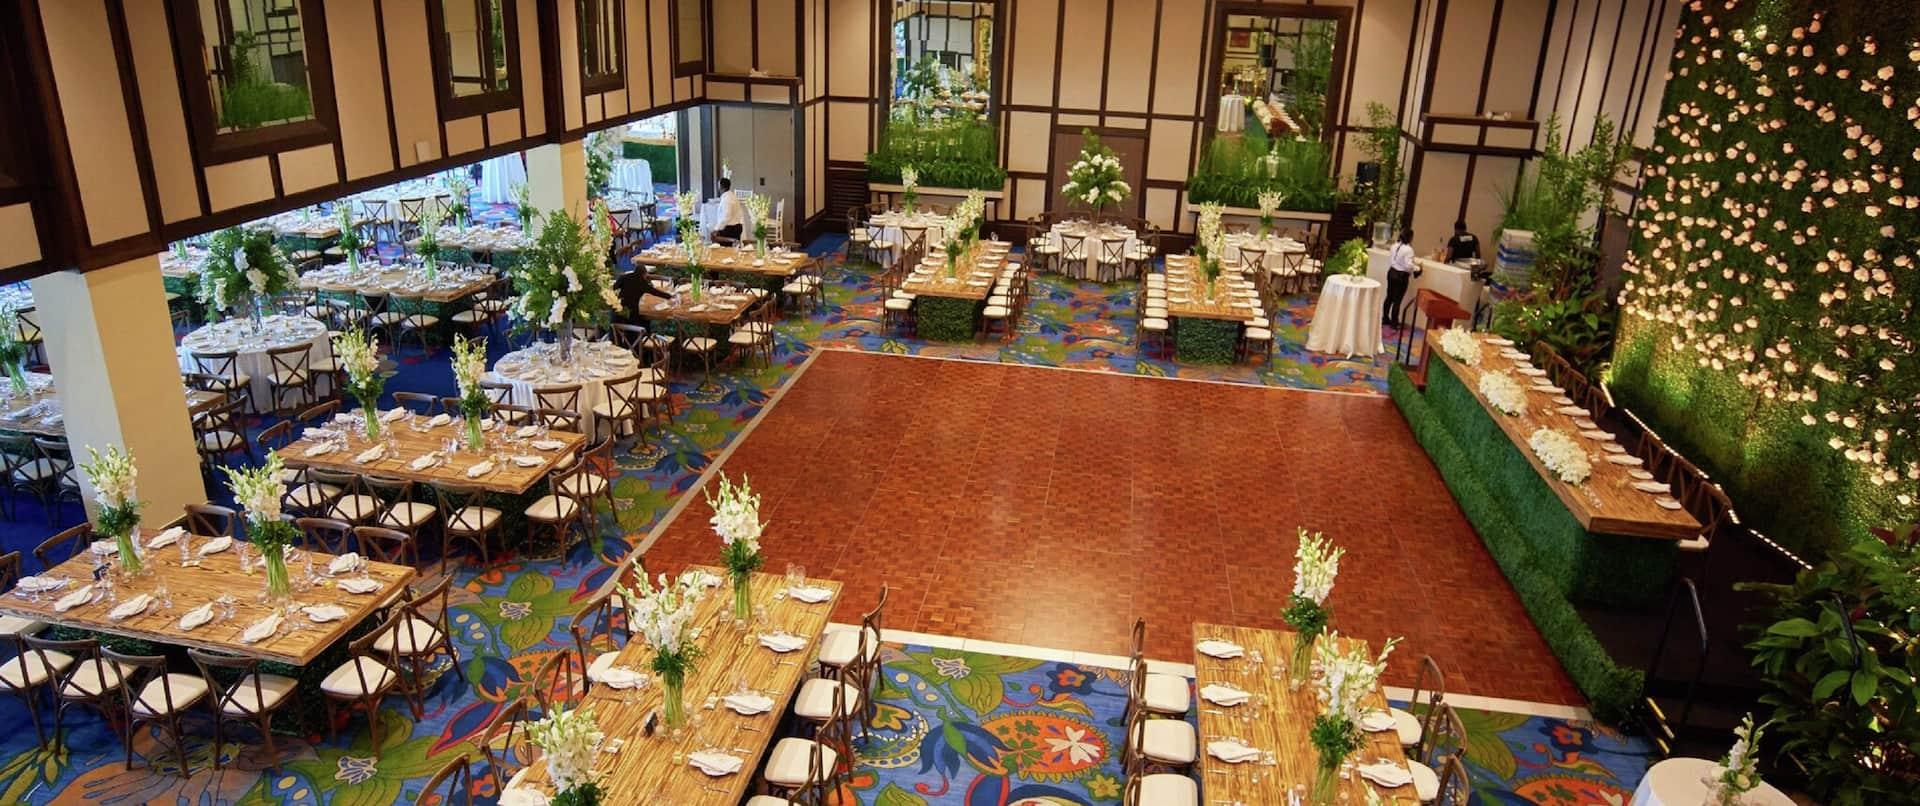 Grand Ballroom with Wedding Decor and Tables Around Dance Floor